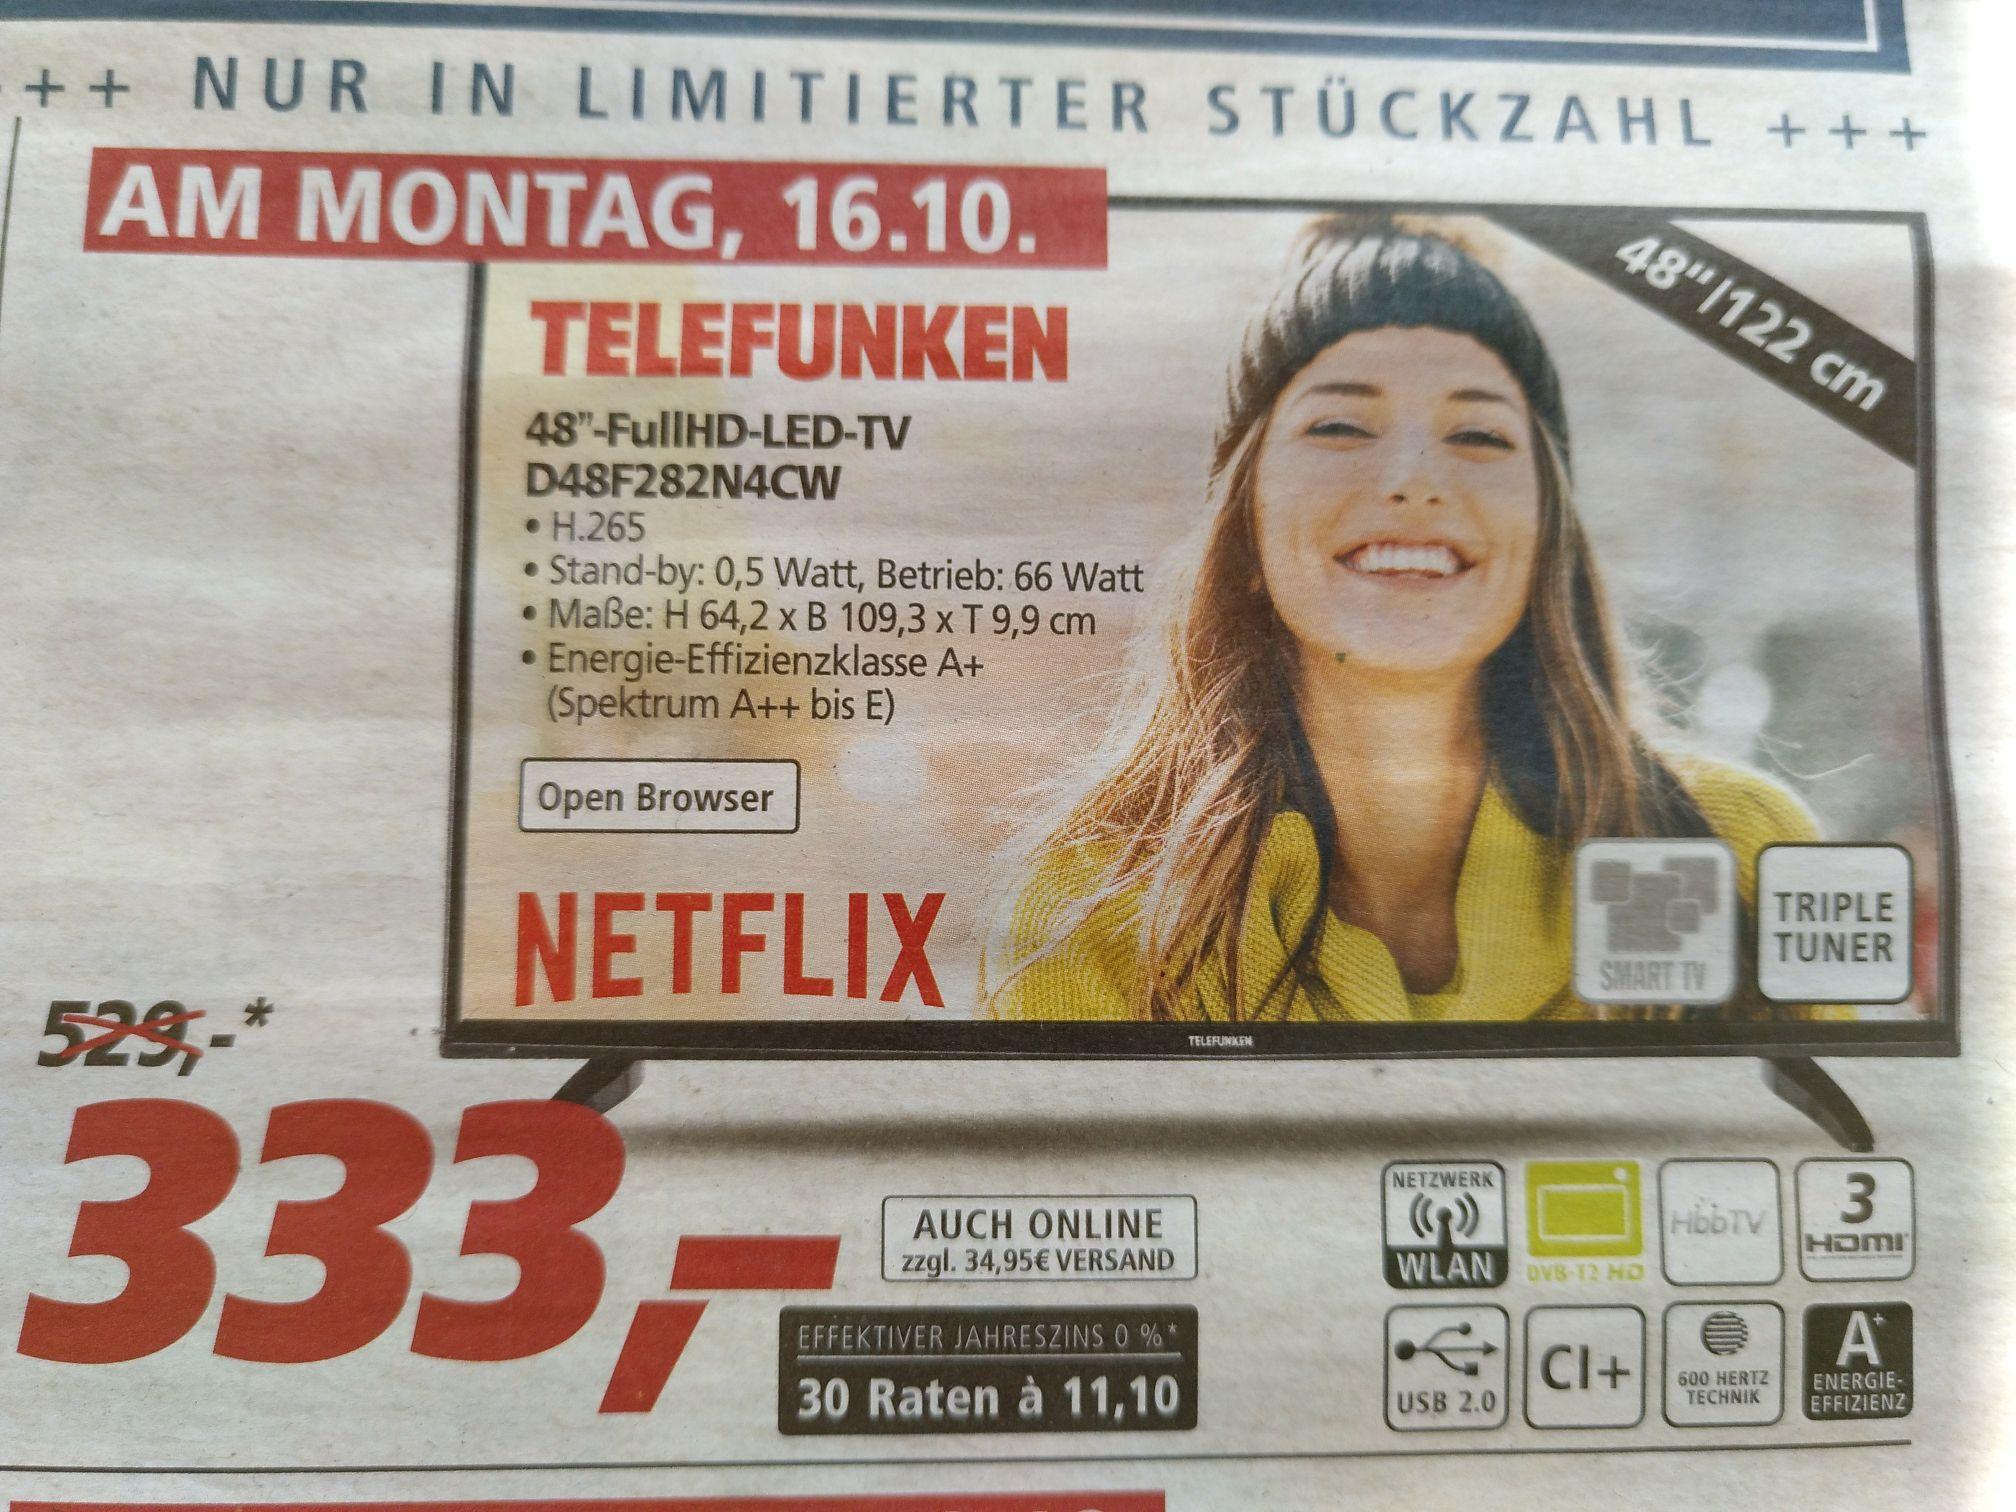 OFFLINE und ONLINE @ REAL Telefunken 48 Zoll D48F282N4CW